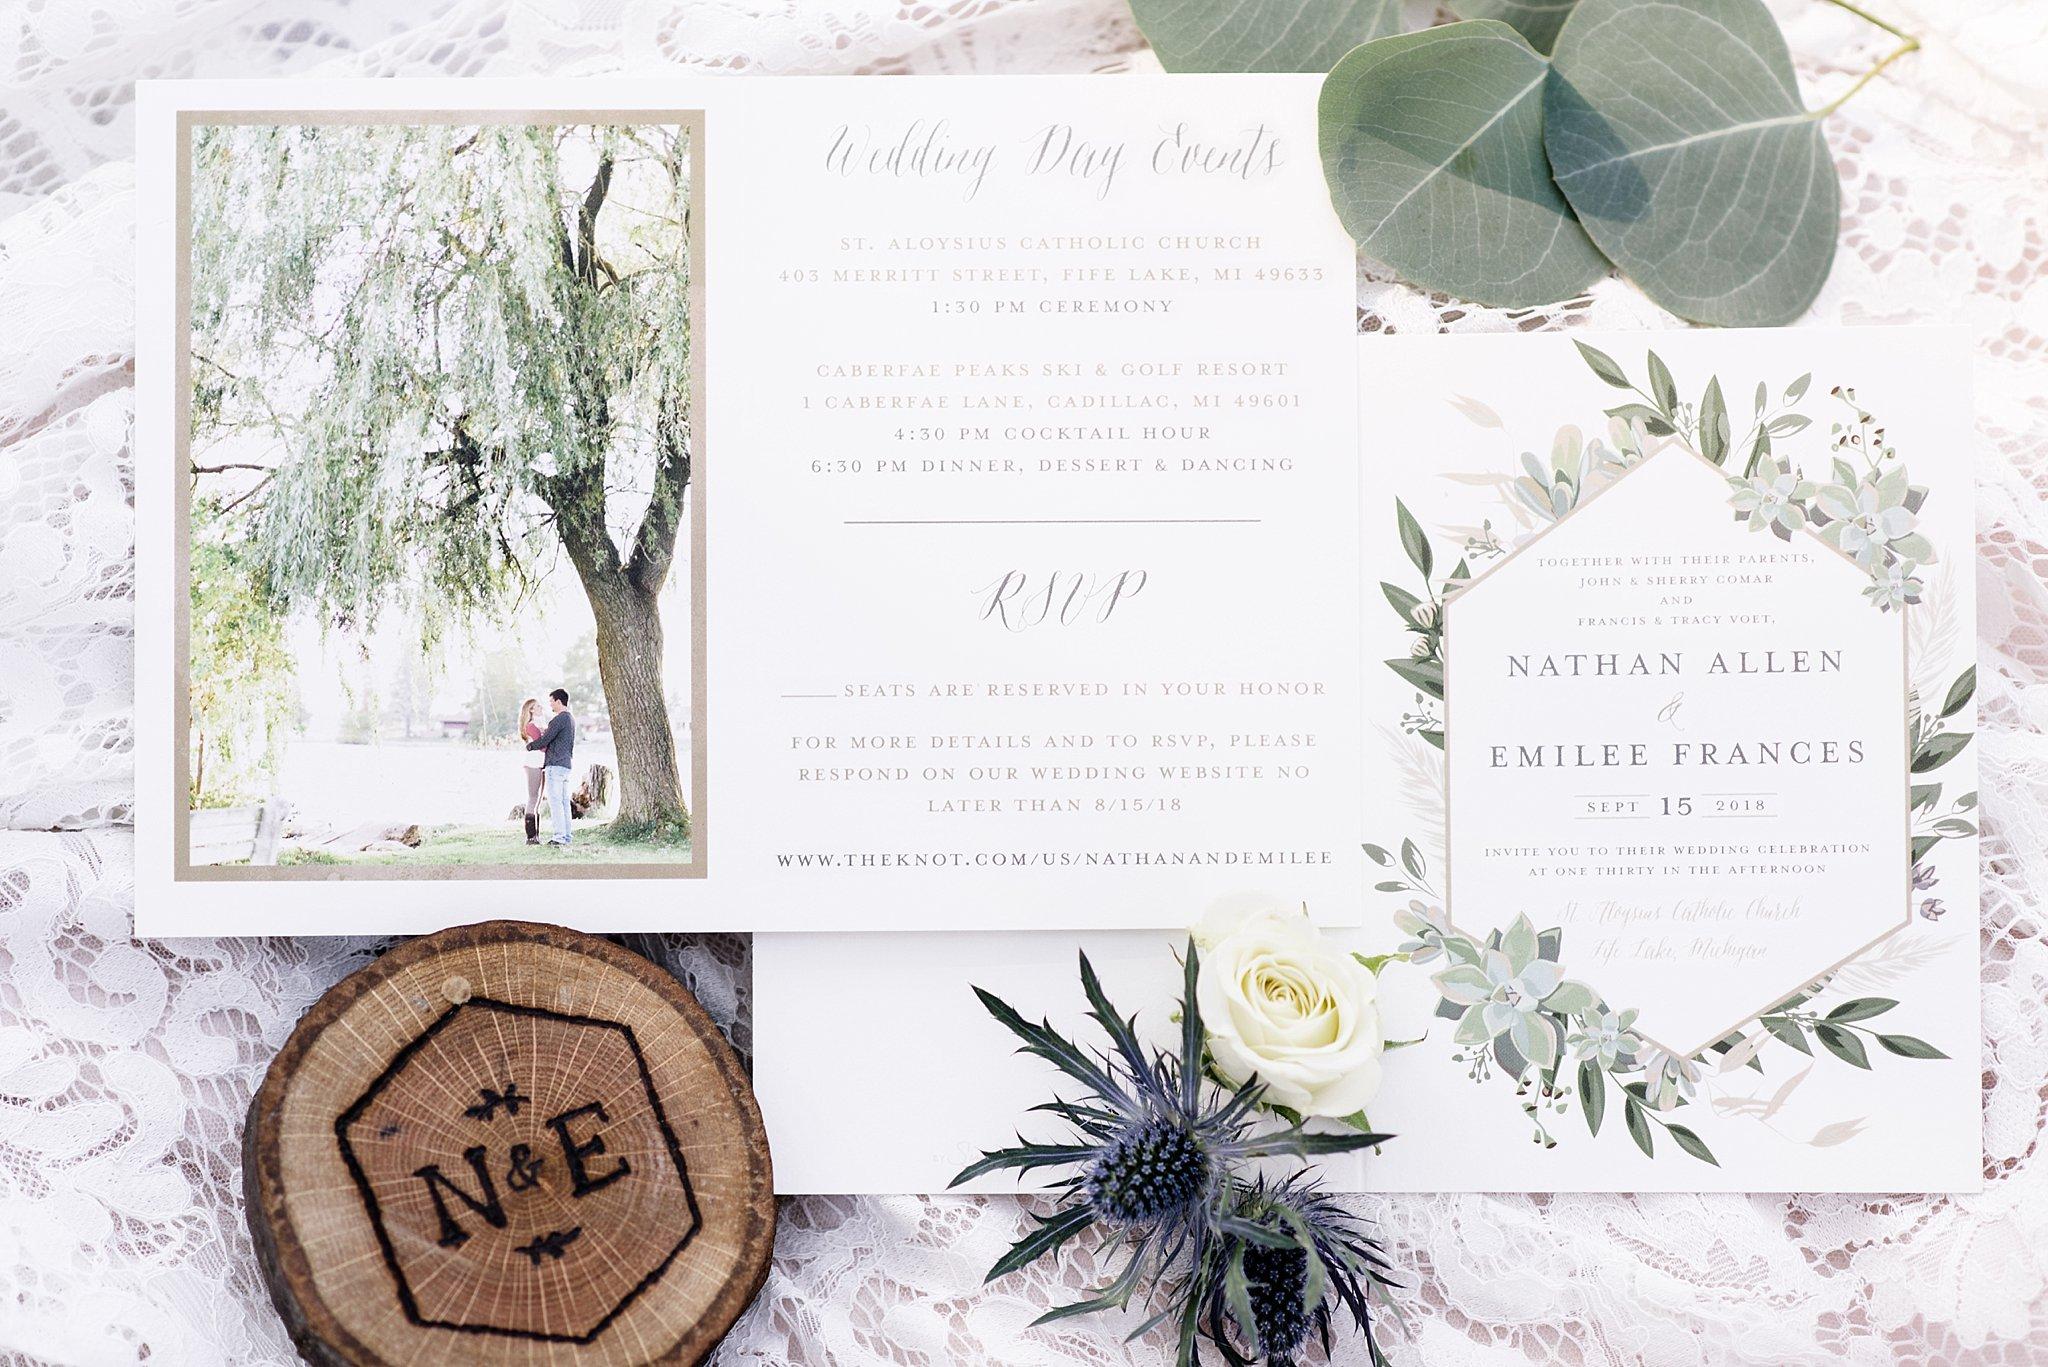 Cadillac-Michigan-wedding-caberfae-peaks-milwaukee-photographer_0004.jpg